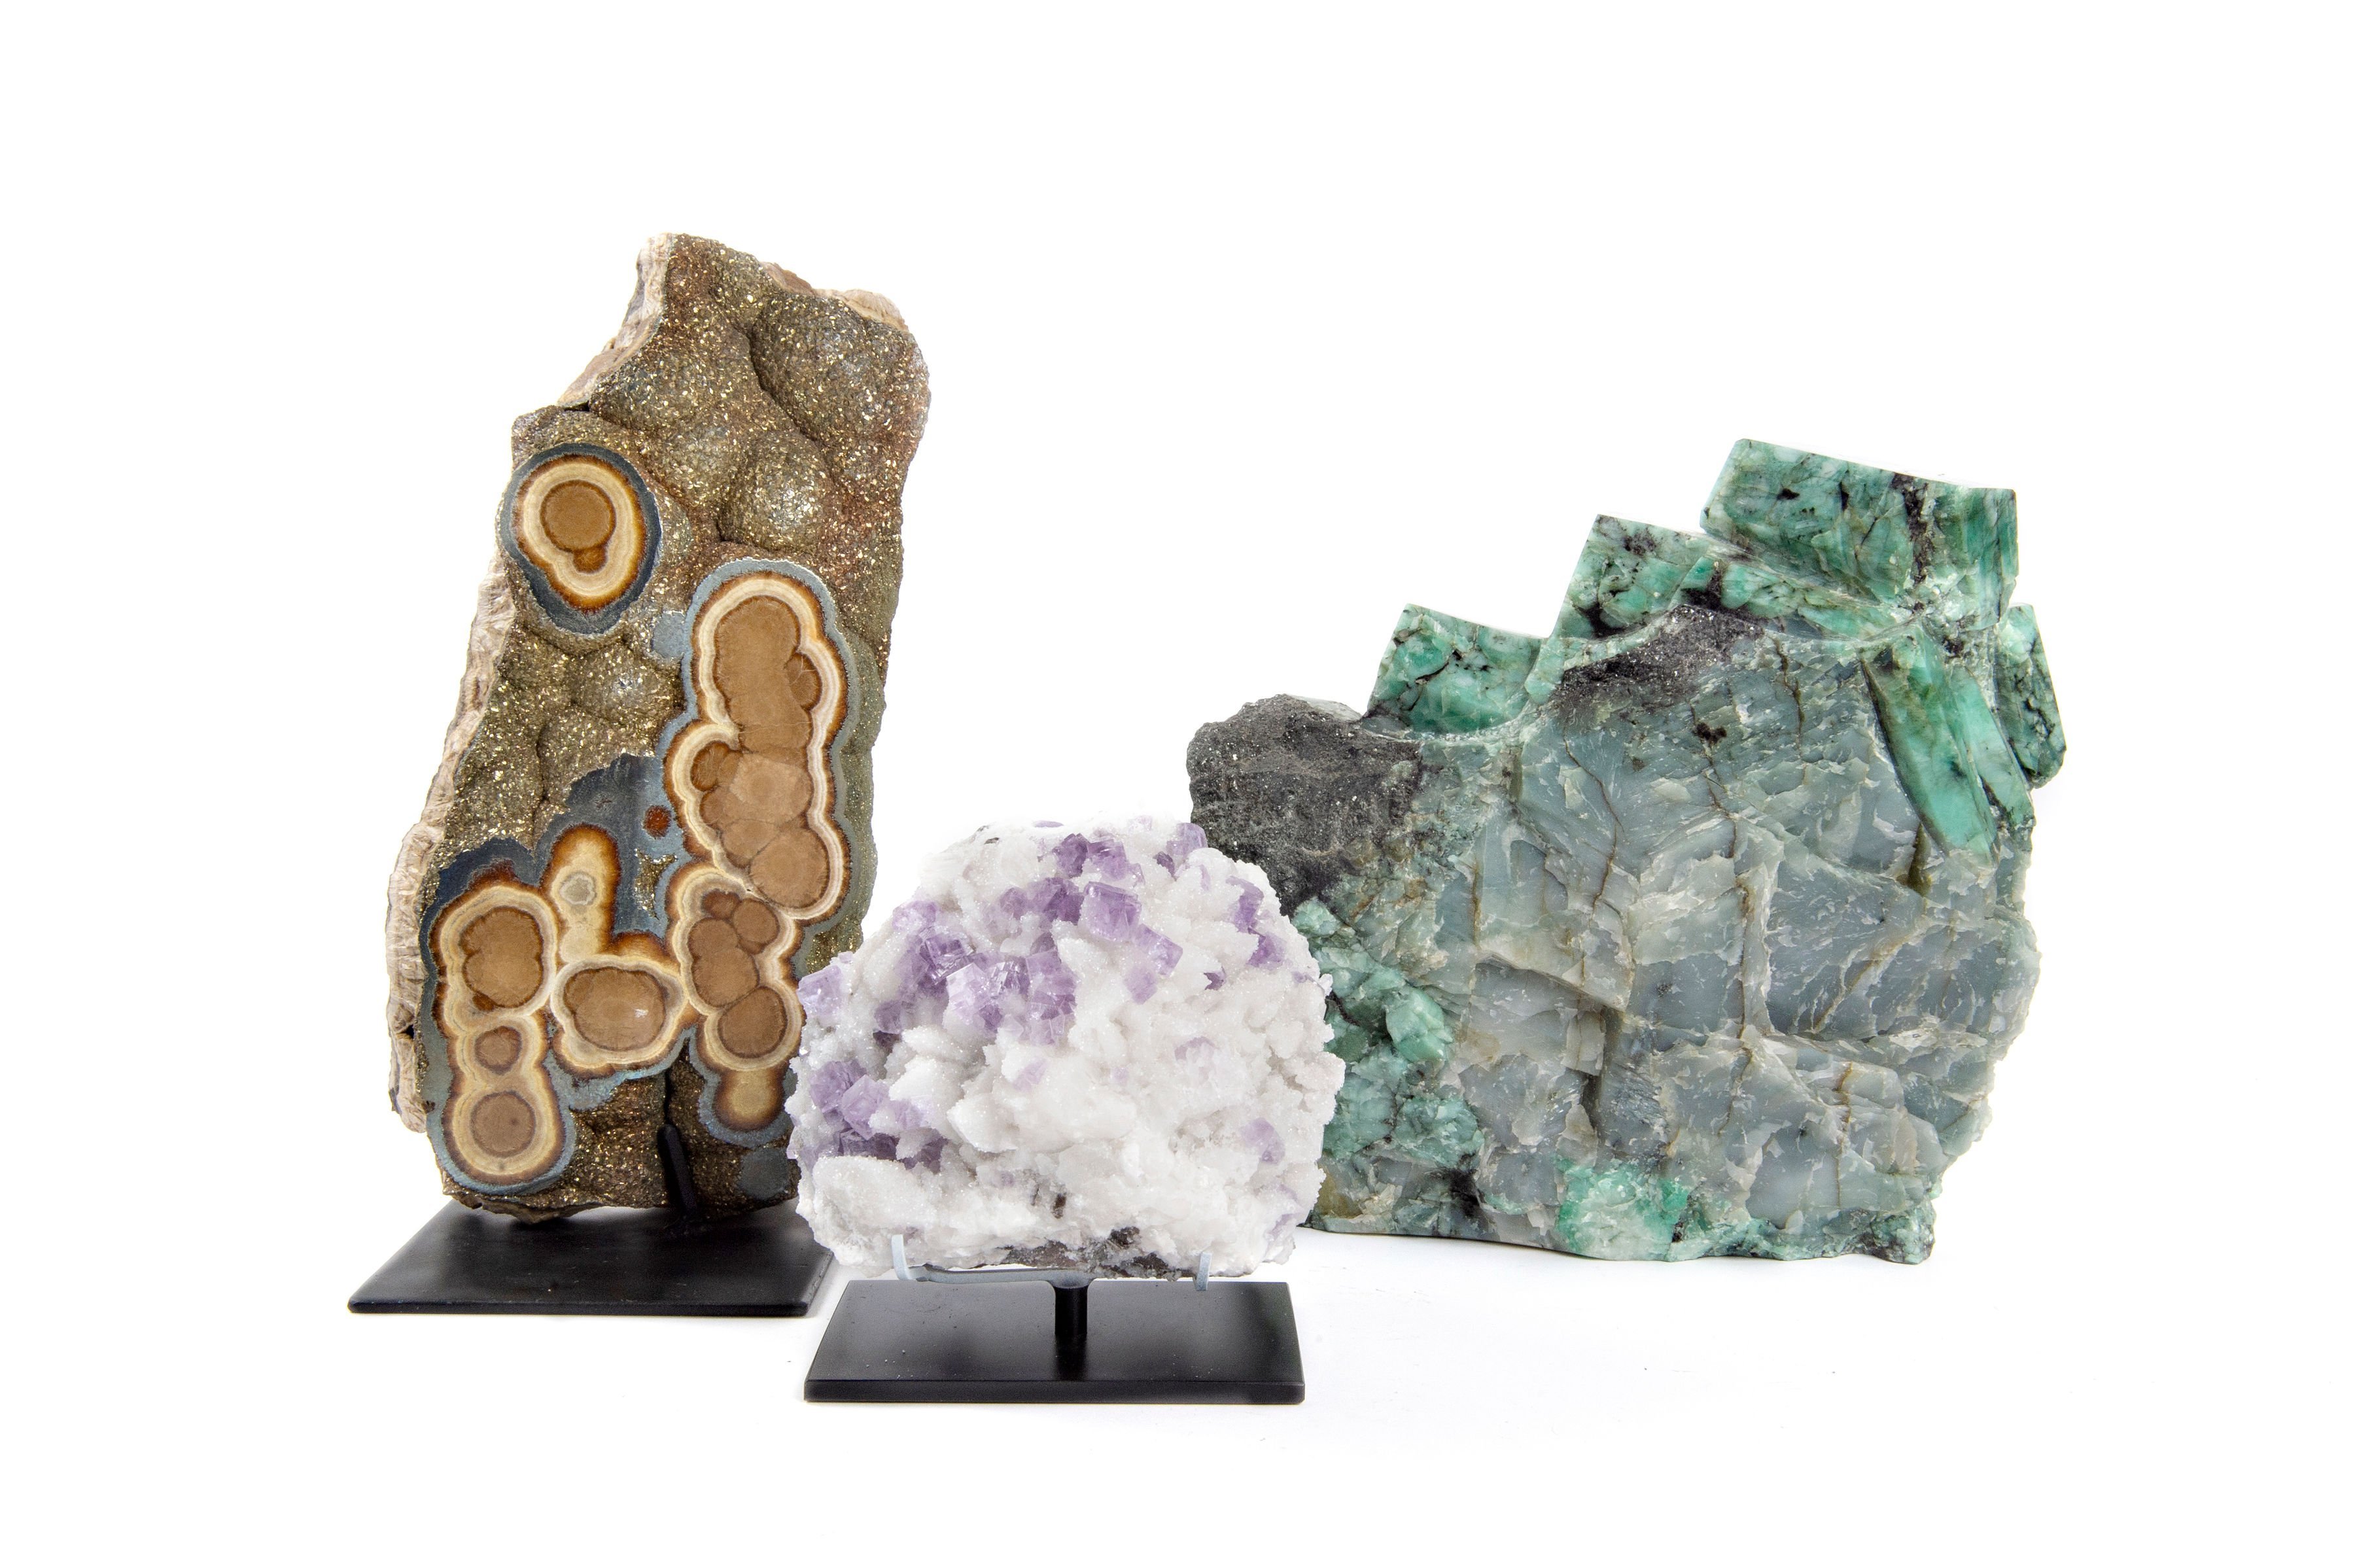 Architectural Minerals & Stones, LLC